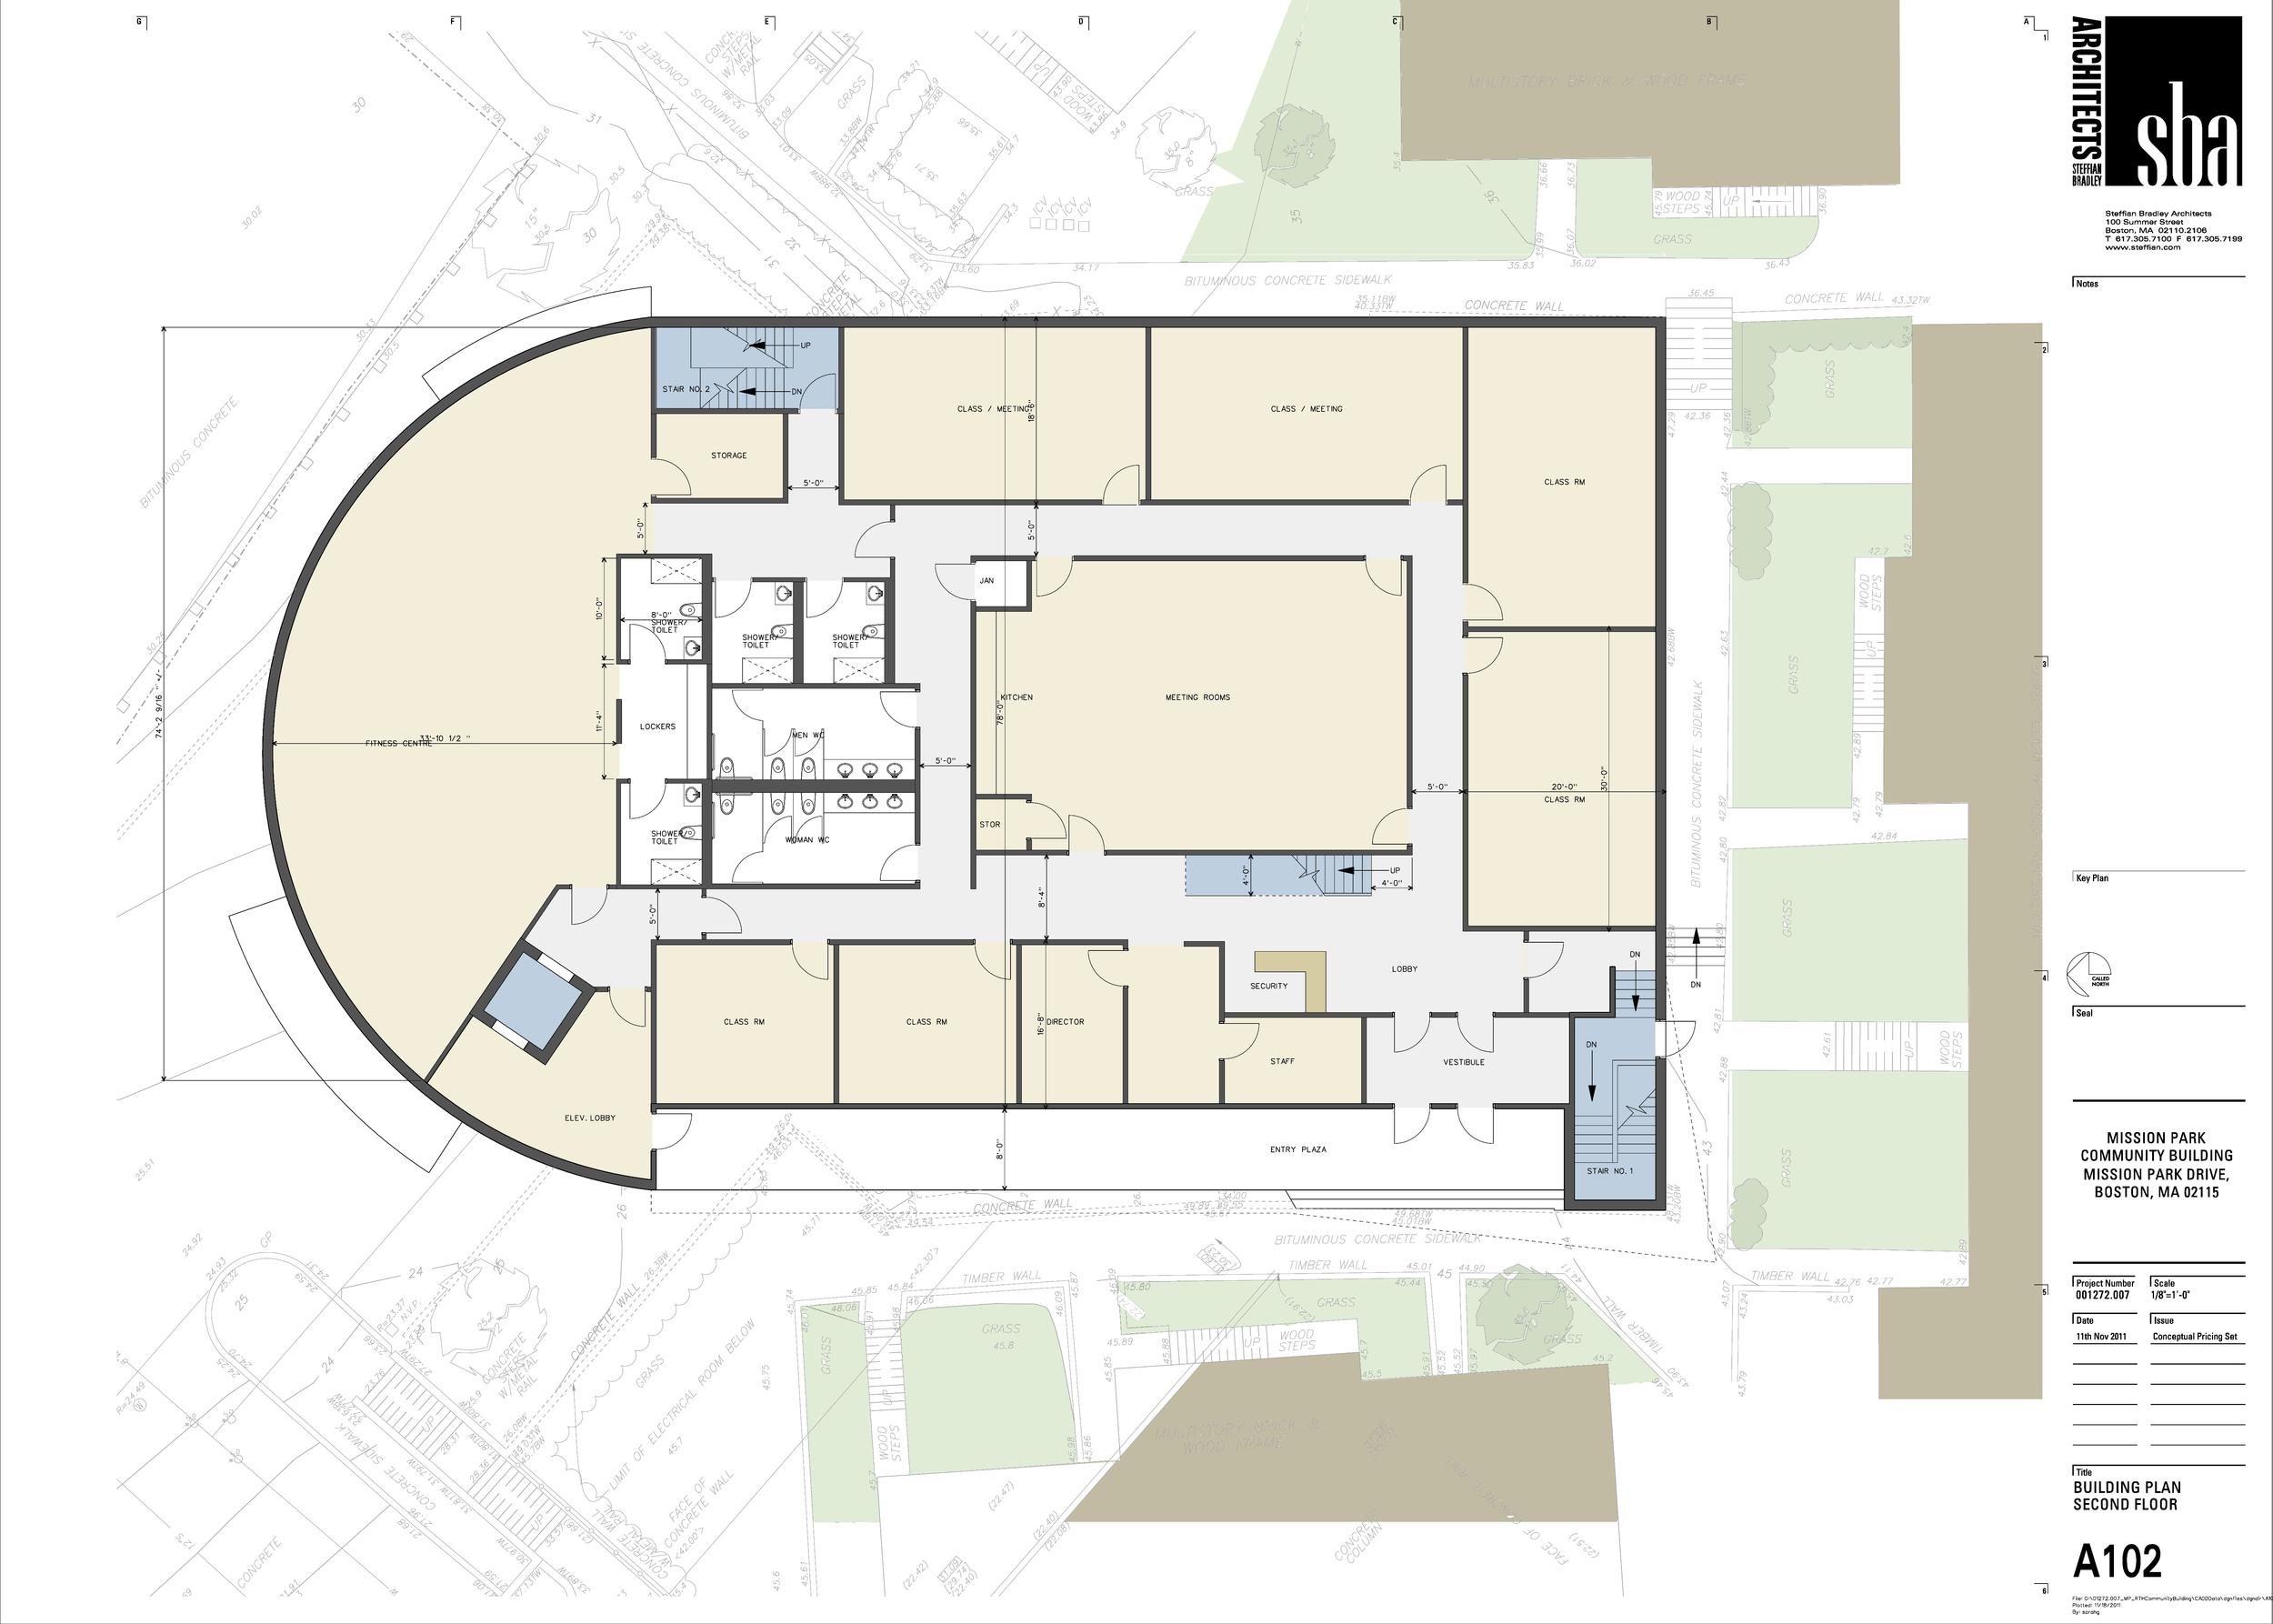 Roxbury Tenants of Harvard Community Center Floorplan